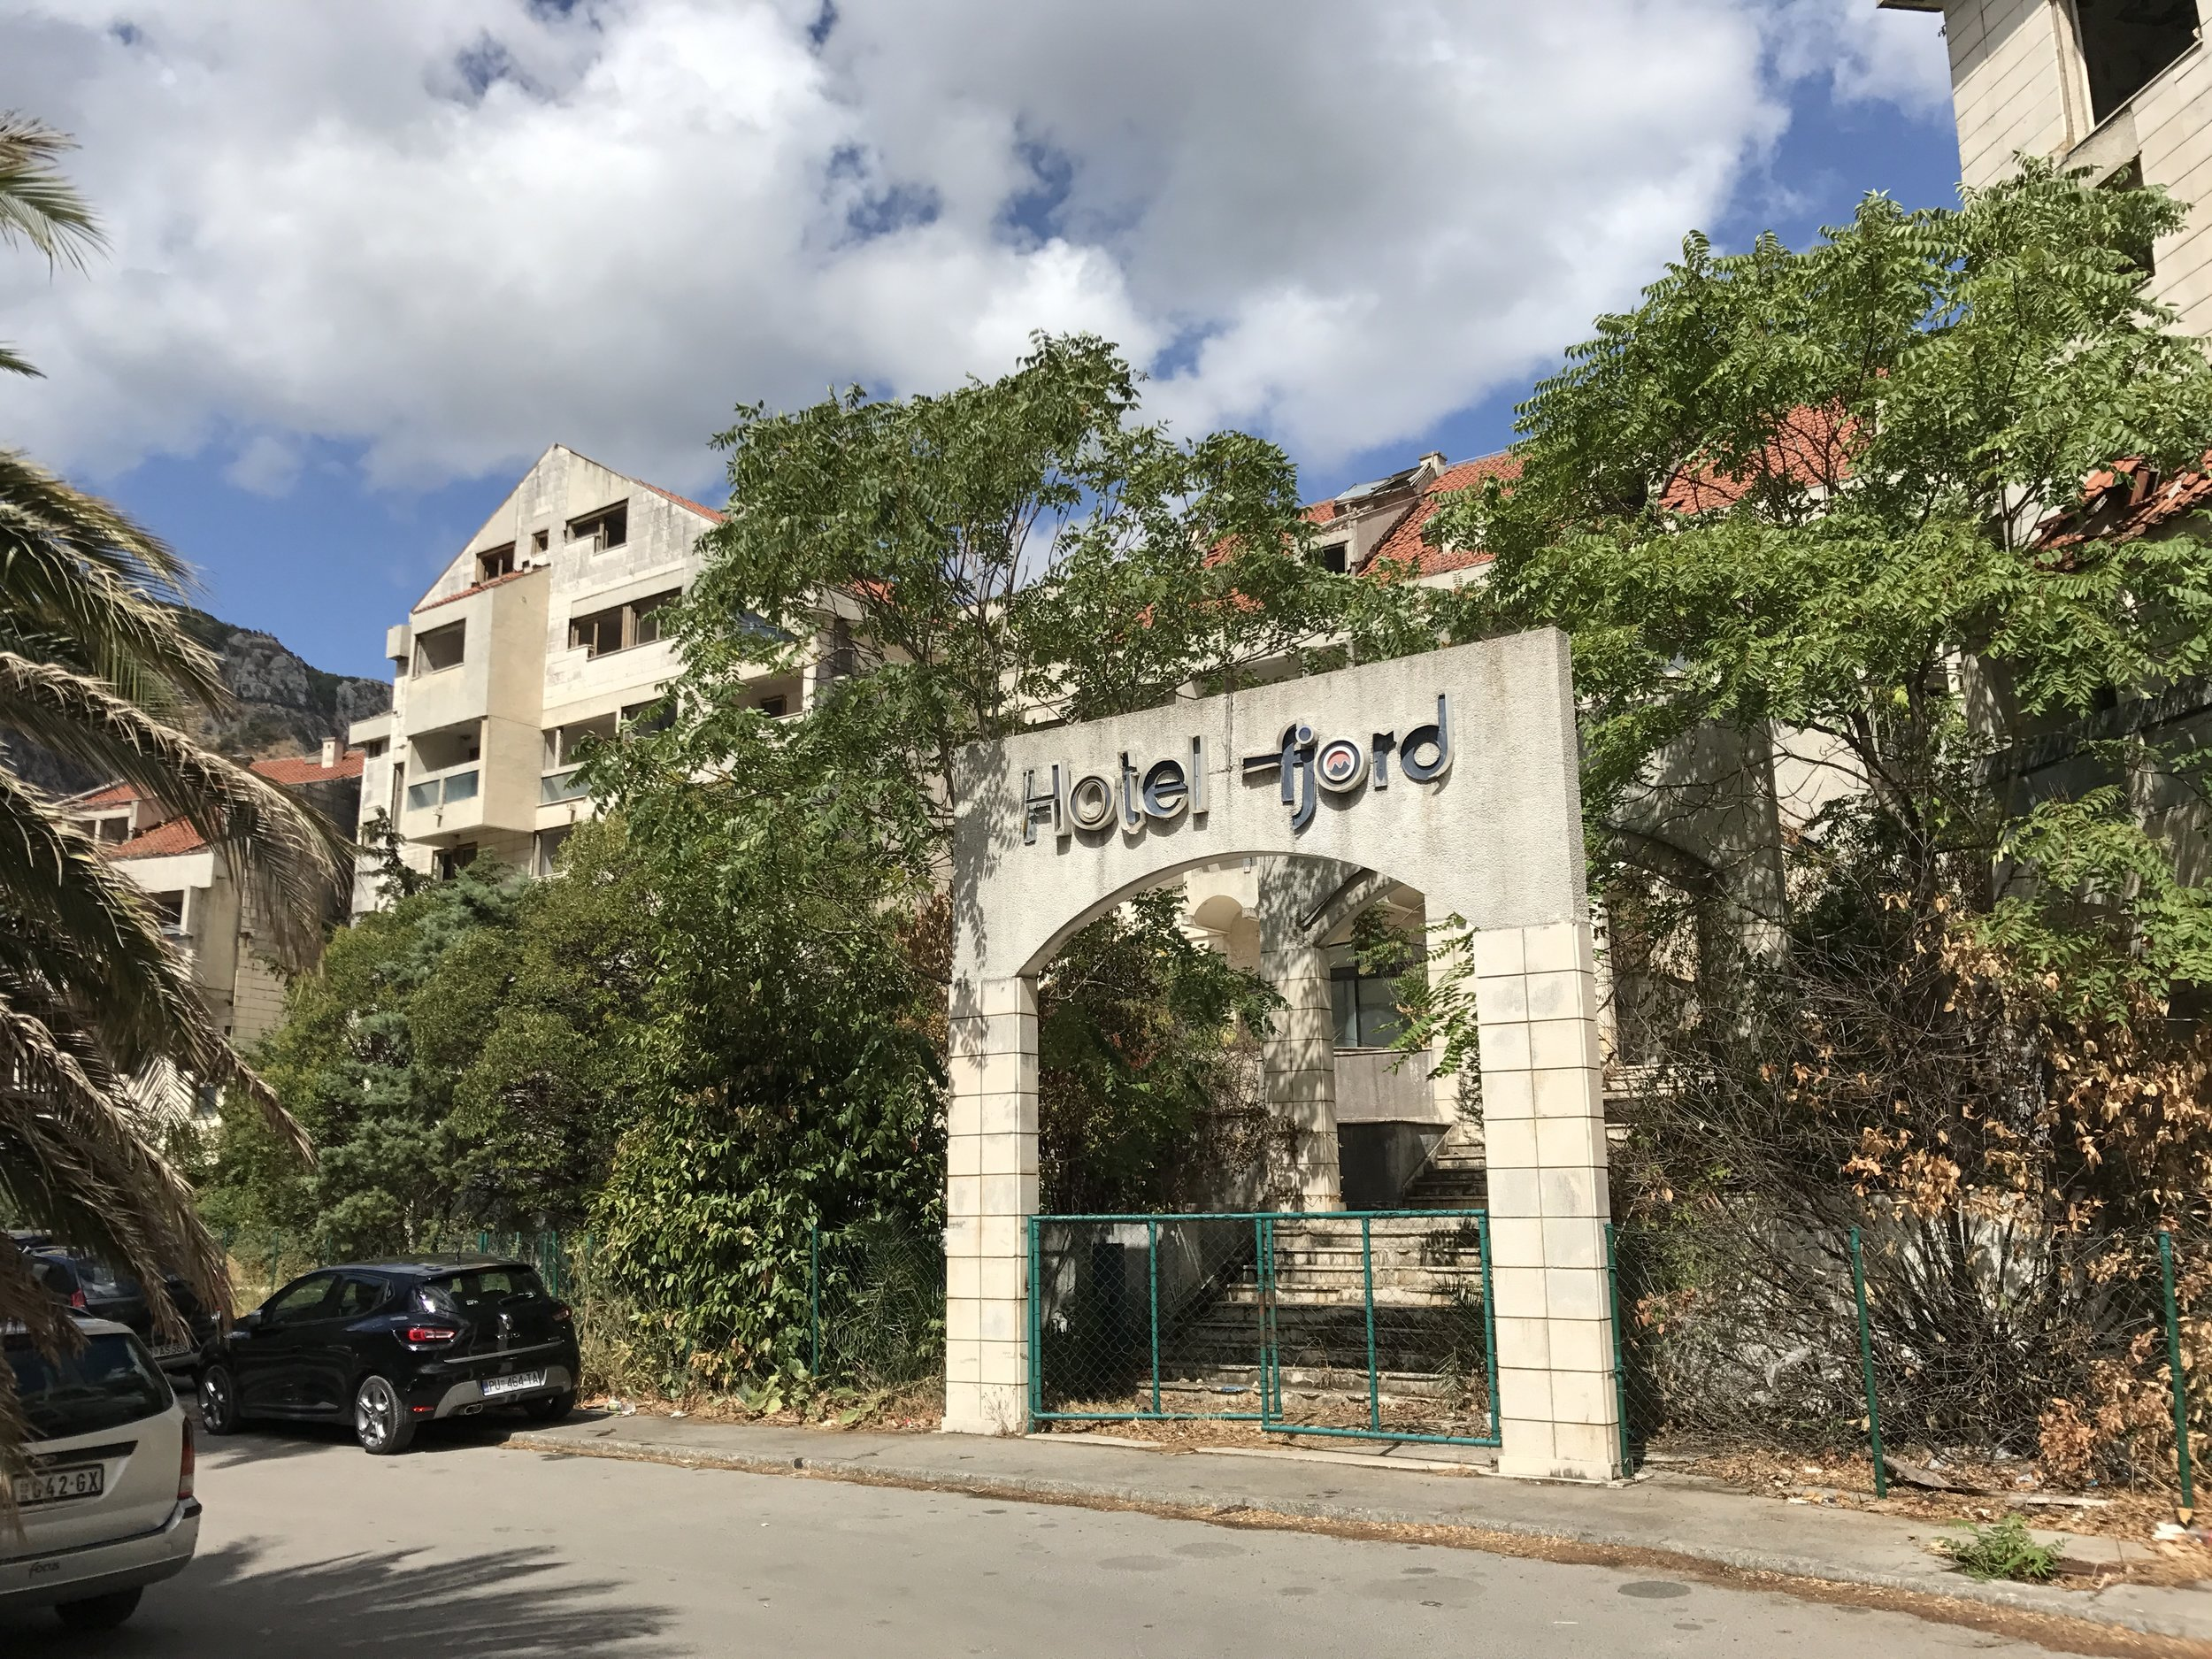 Hotel-Fjord-Entrance-Kotor-Montenegro